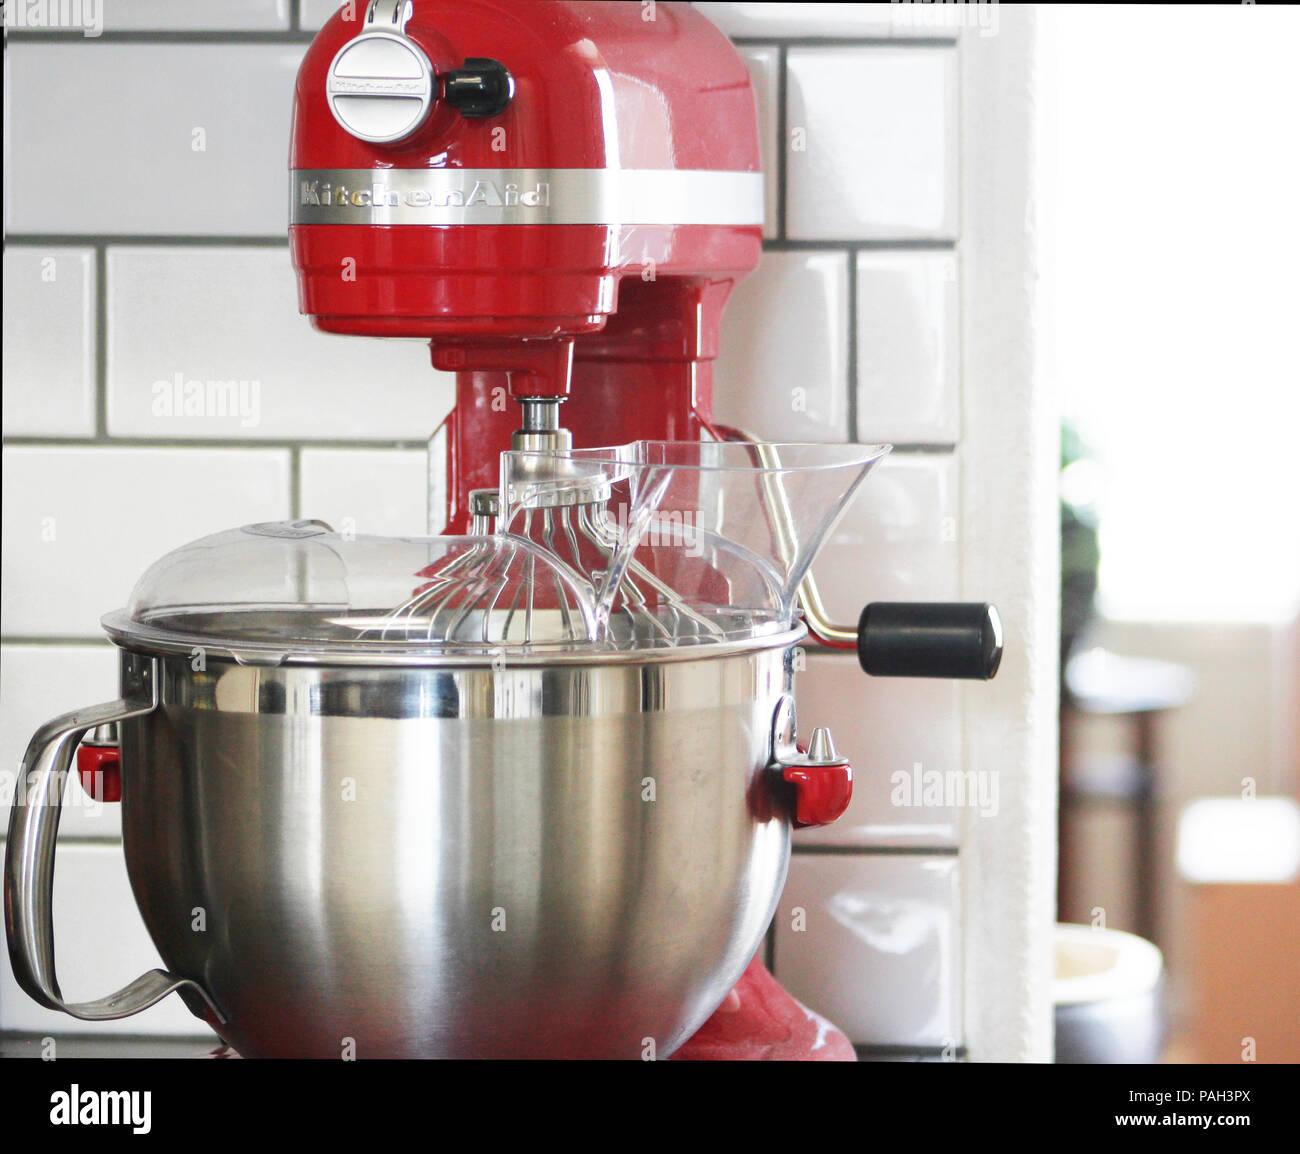 https www alamy com a red kitchenaid mixer against a white subway tile backsplash image213047154 html